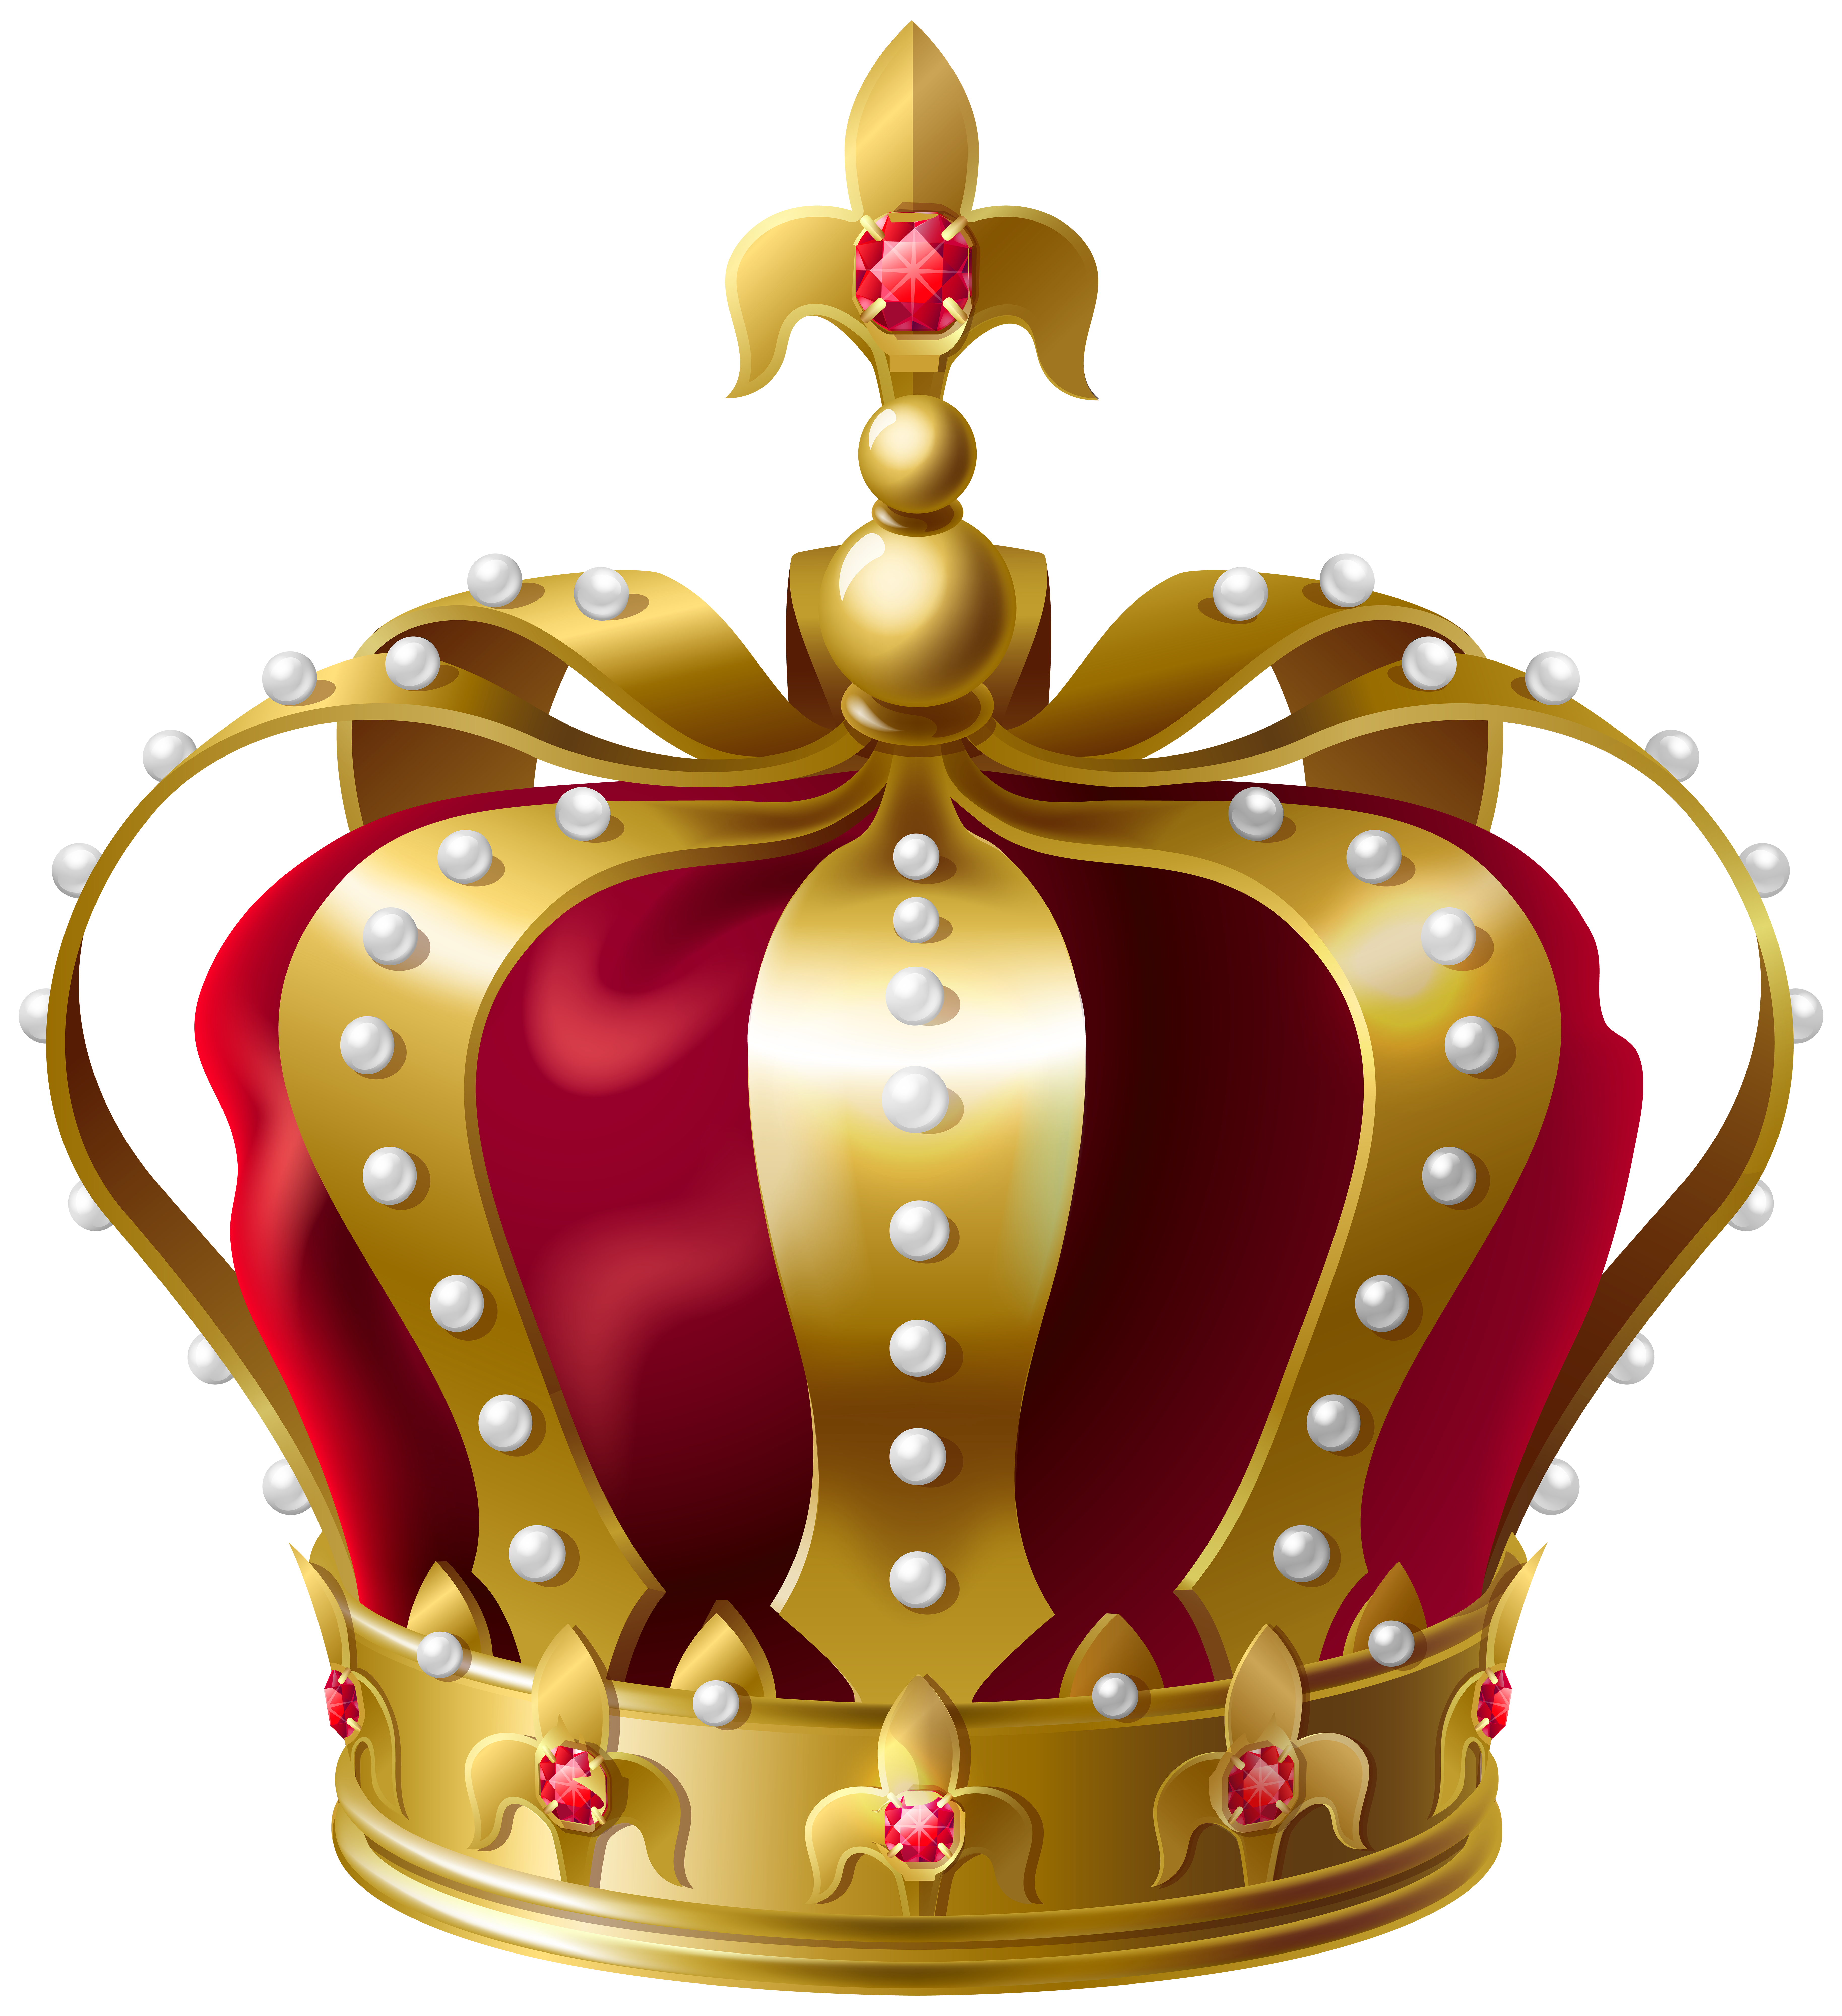 King Crown Transparent PNG Clip Art Image.